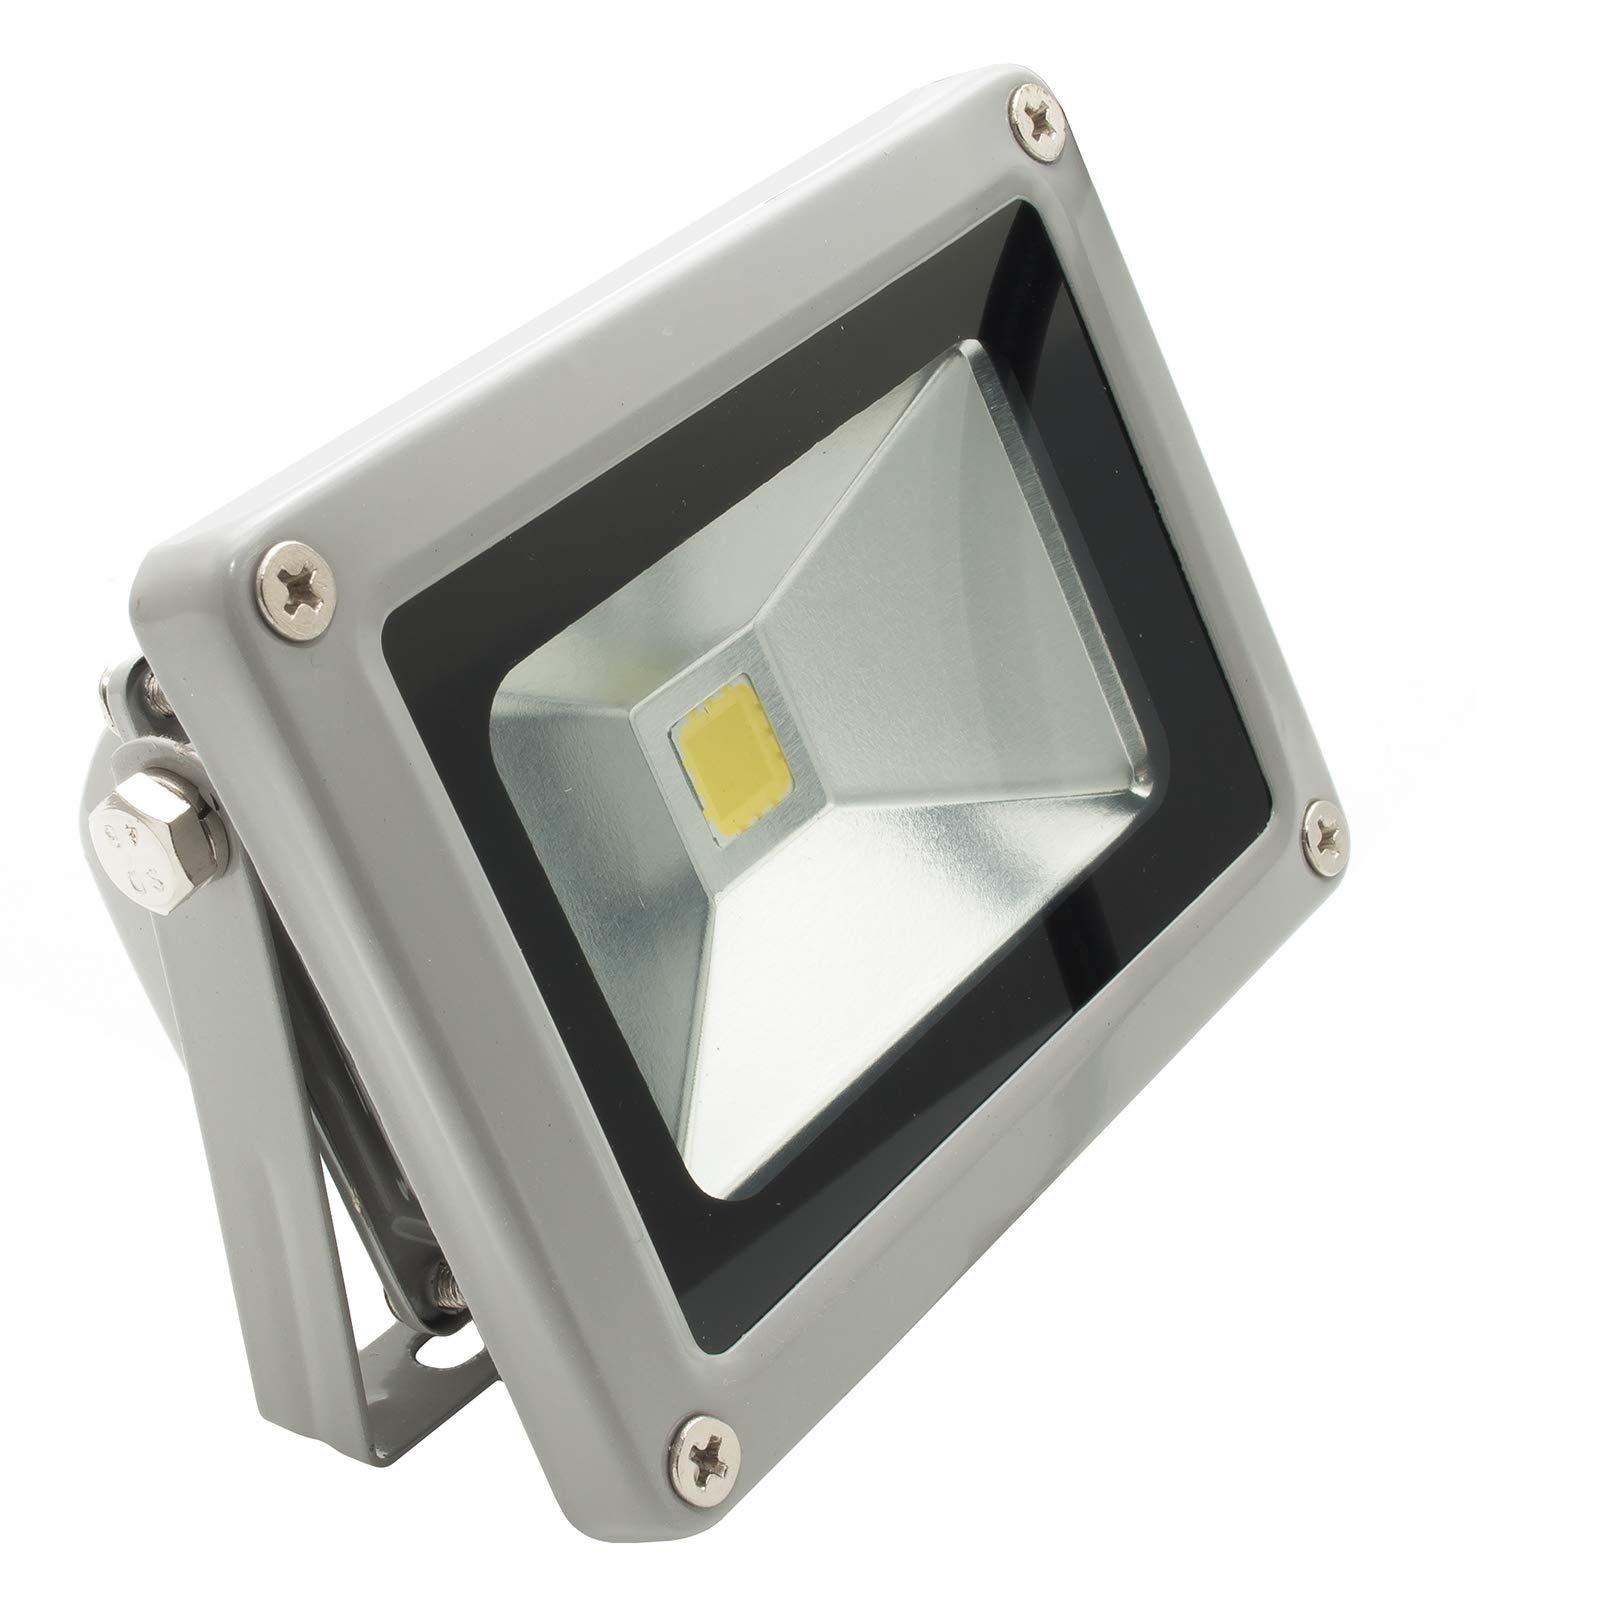 Foco LED de exterior E Interior 10 W Foco LED para jardín carteles escaparates IP65: Amazon.es: Iluminación